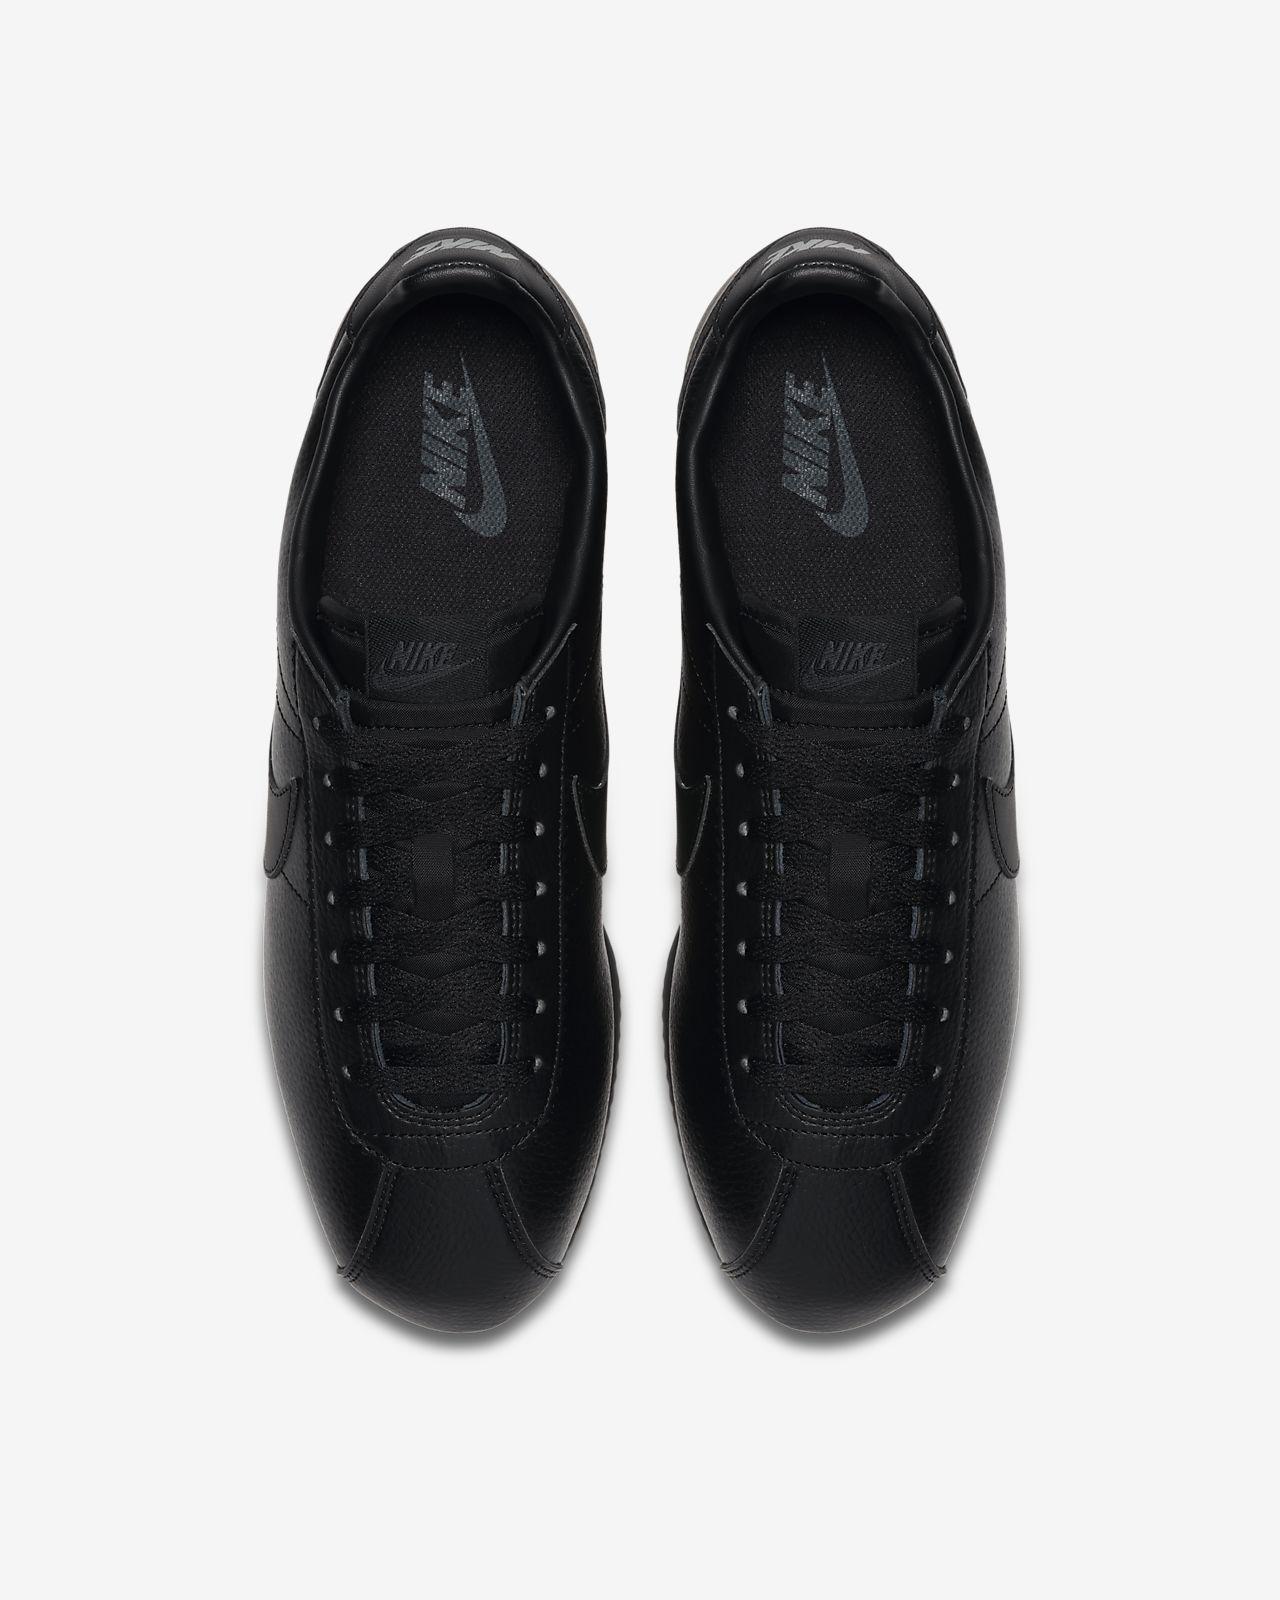 buy popular a4035 70d09 ... Chaussure Nike Classic Cortez pour Homme